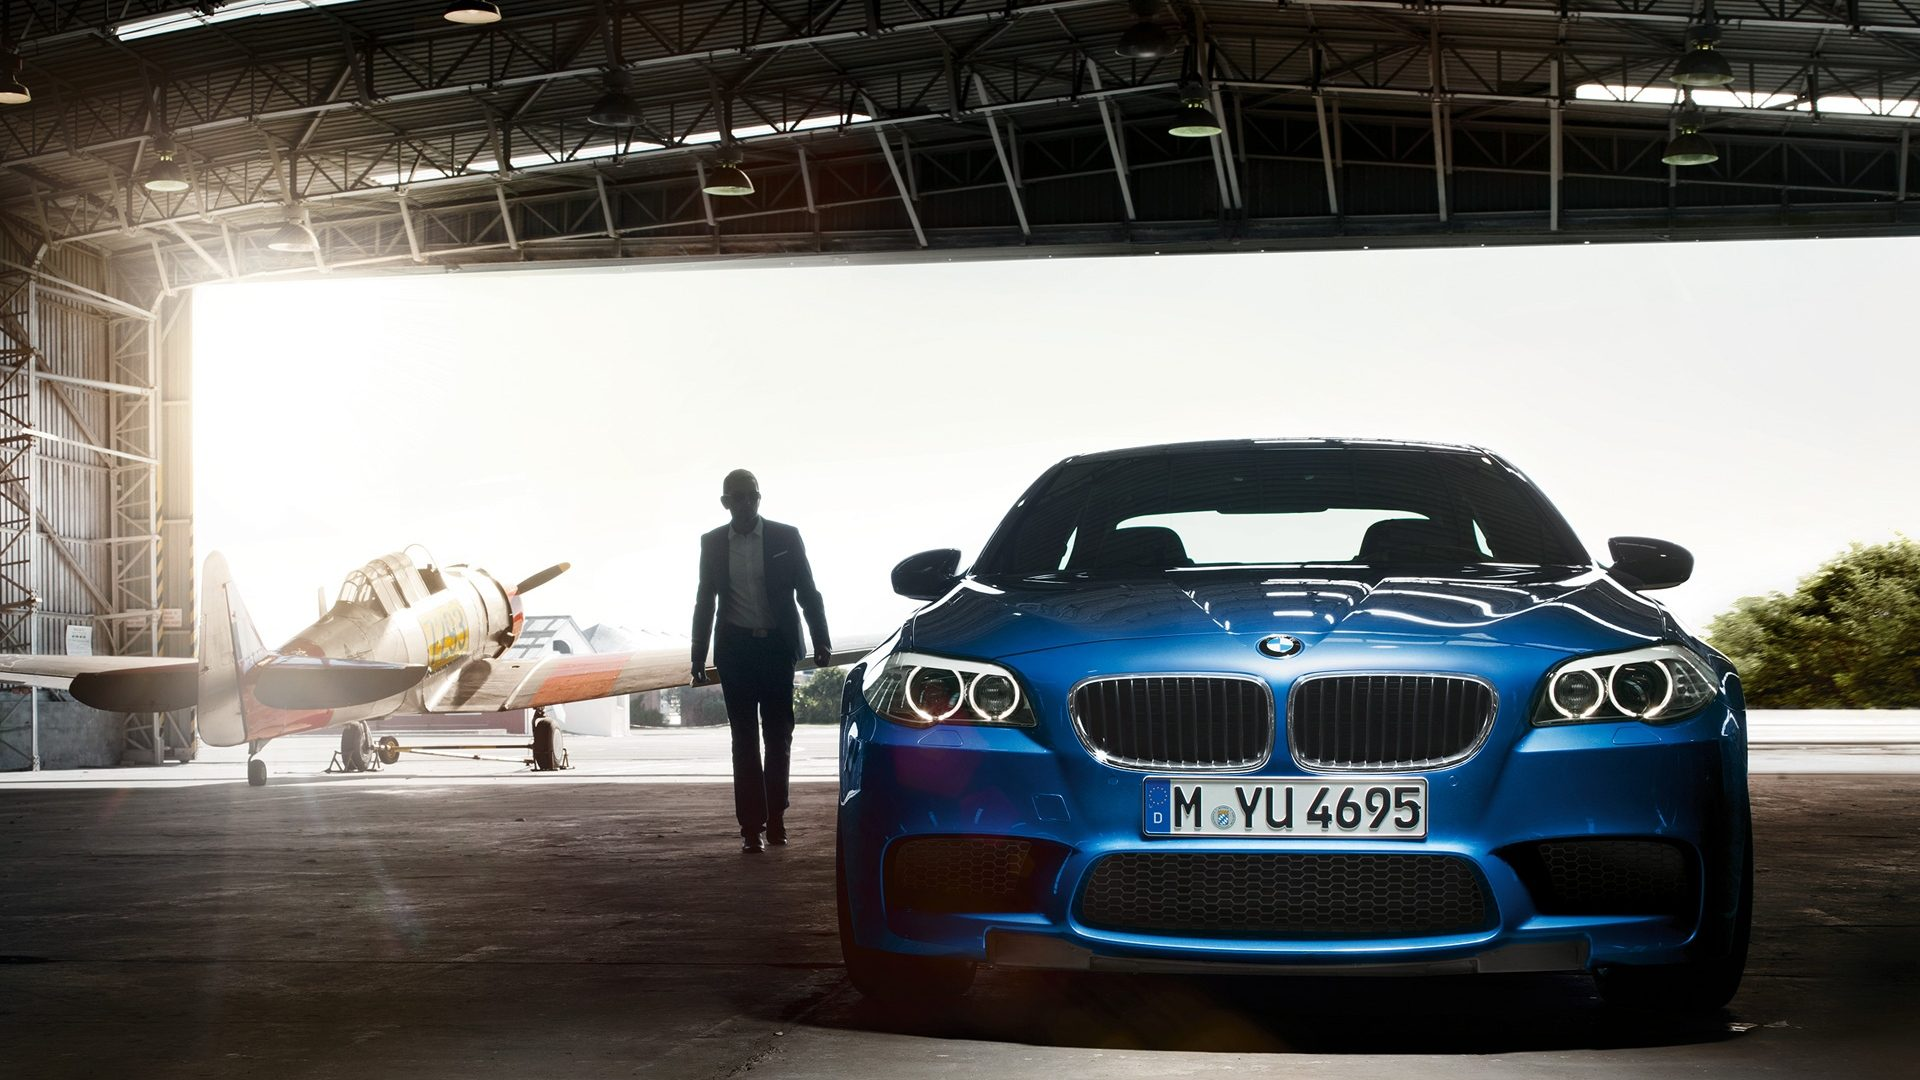 http://static.autoblog.nl/images/wp2011/wallpaper/BMW_M5_F10_Wallpaper1609_01.jpg